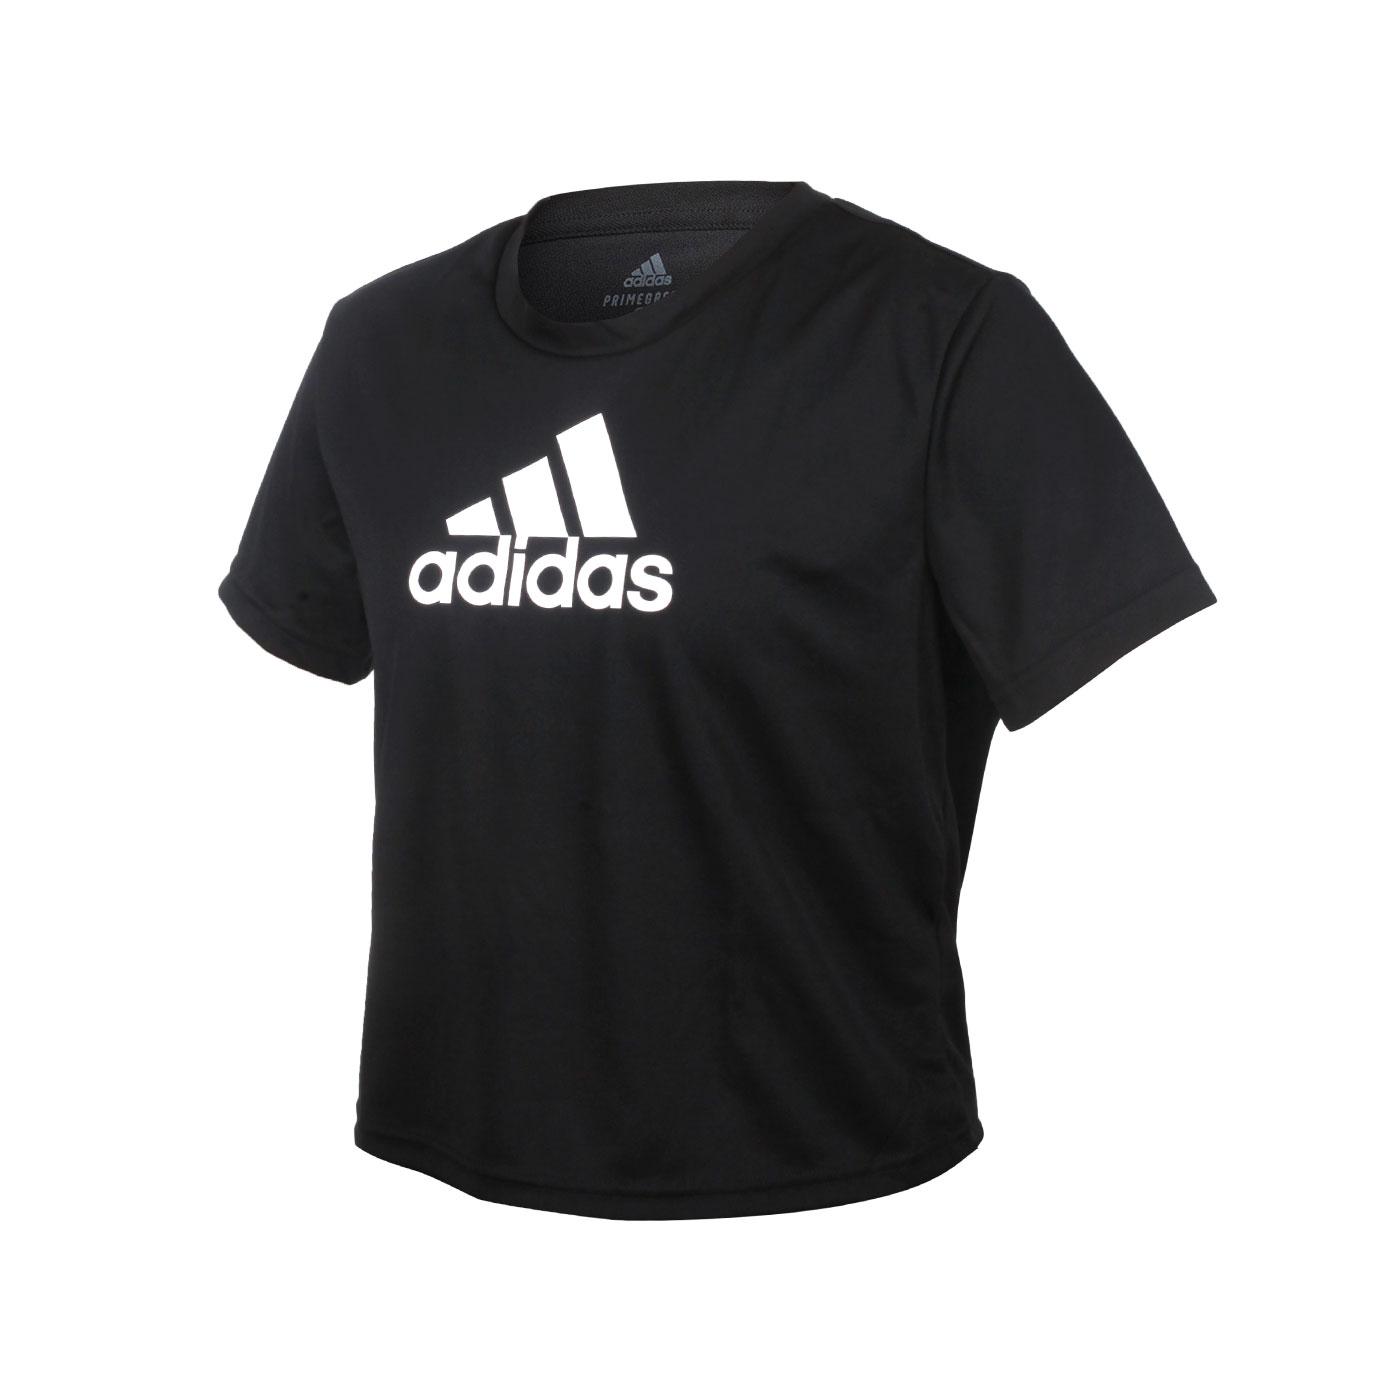 ADIDAS 女款短袖T恤 GL3830